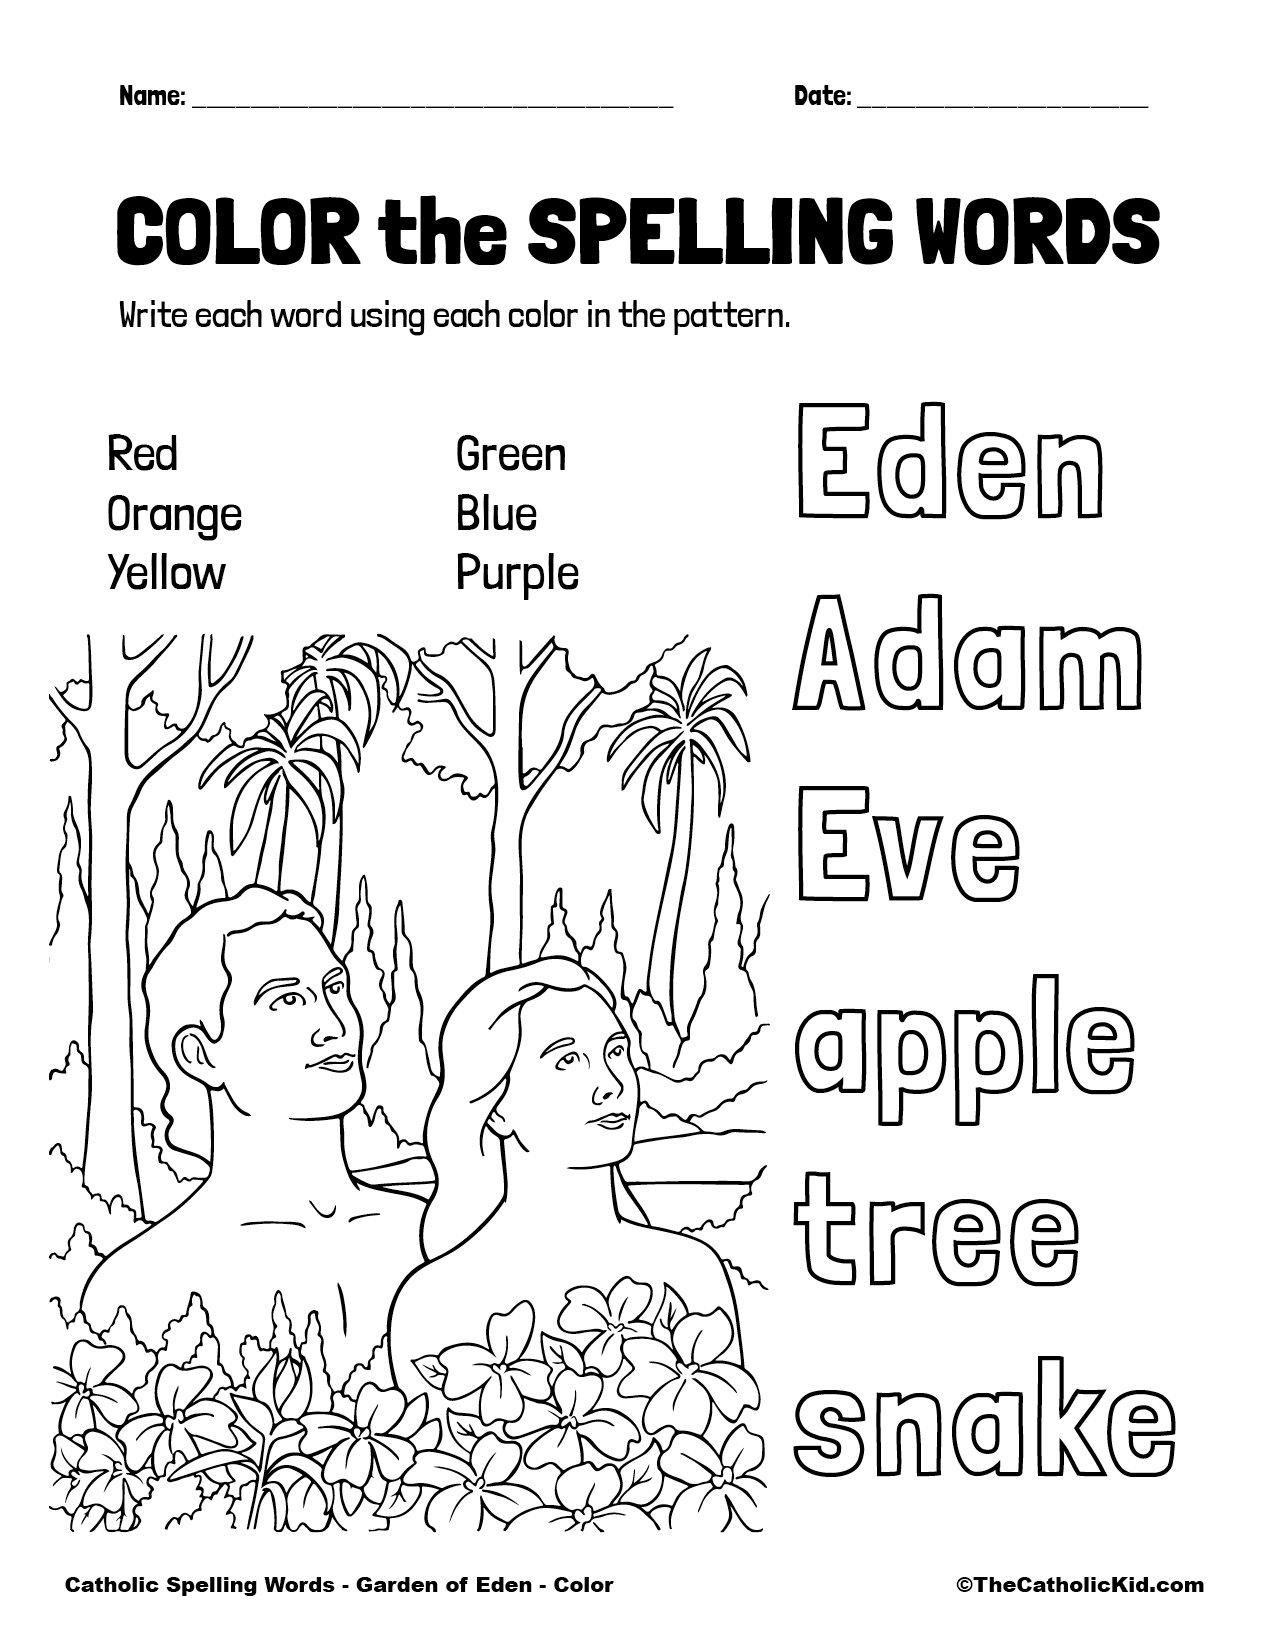 Catholic Spelling & Vocabulary Words Garden of Eden Worksheet 2 Trace